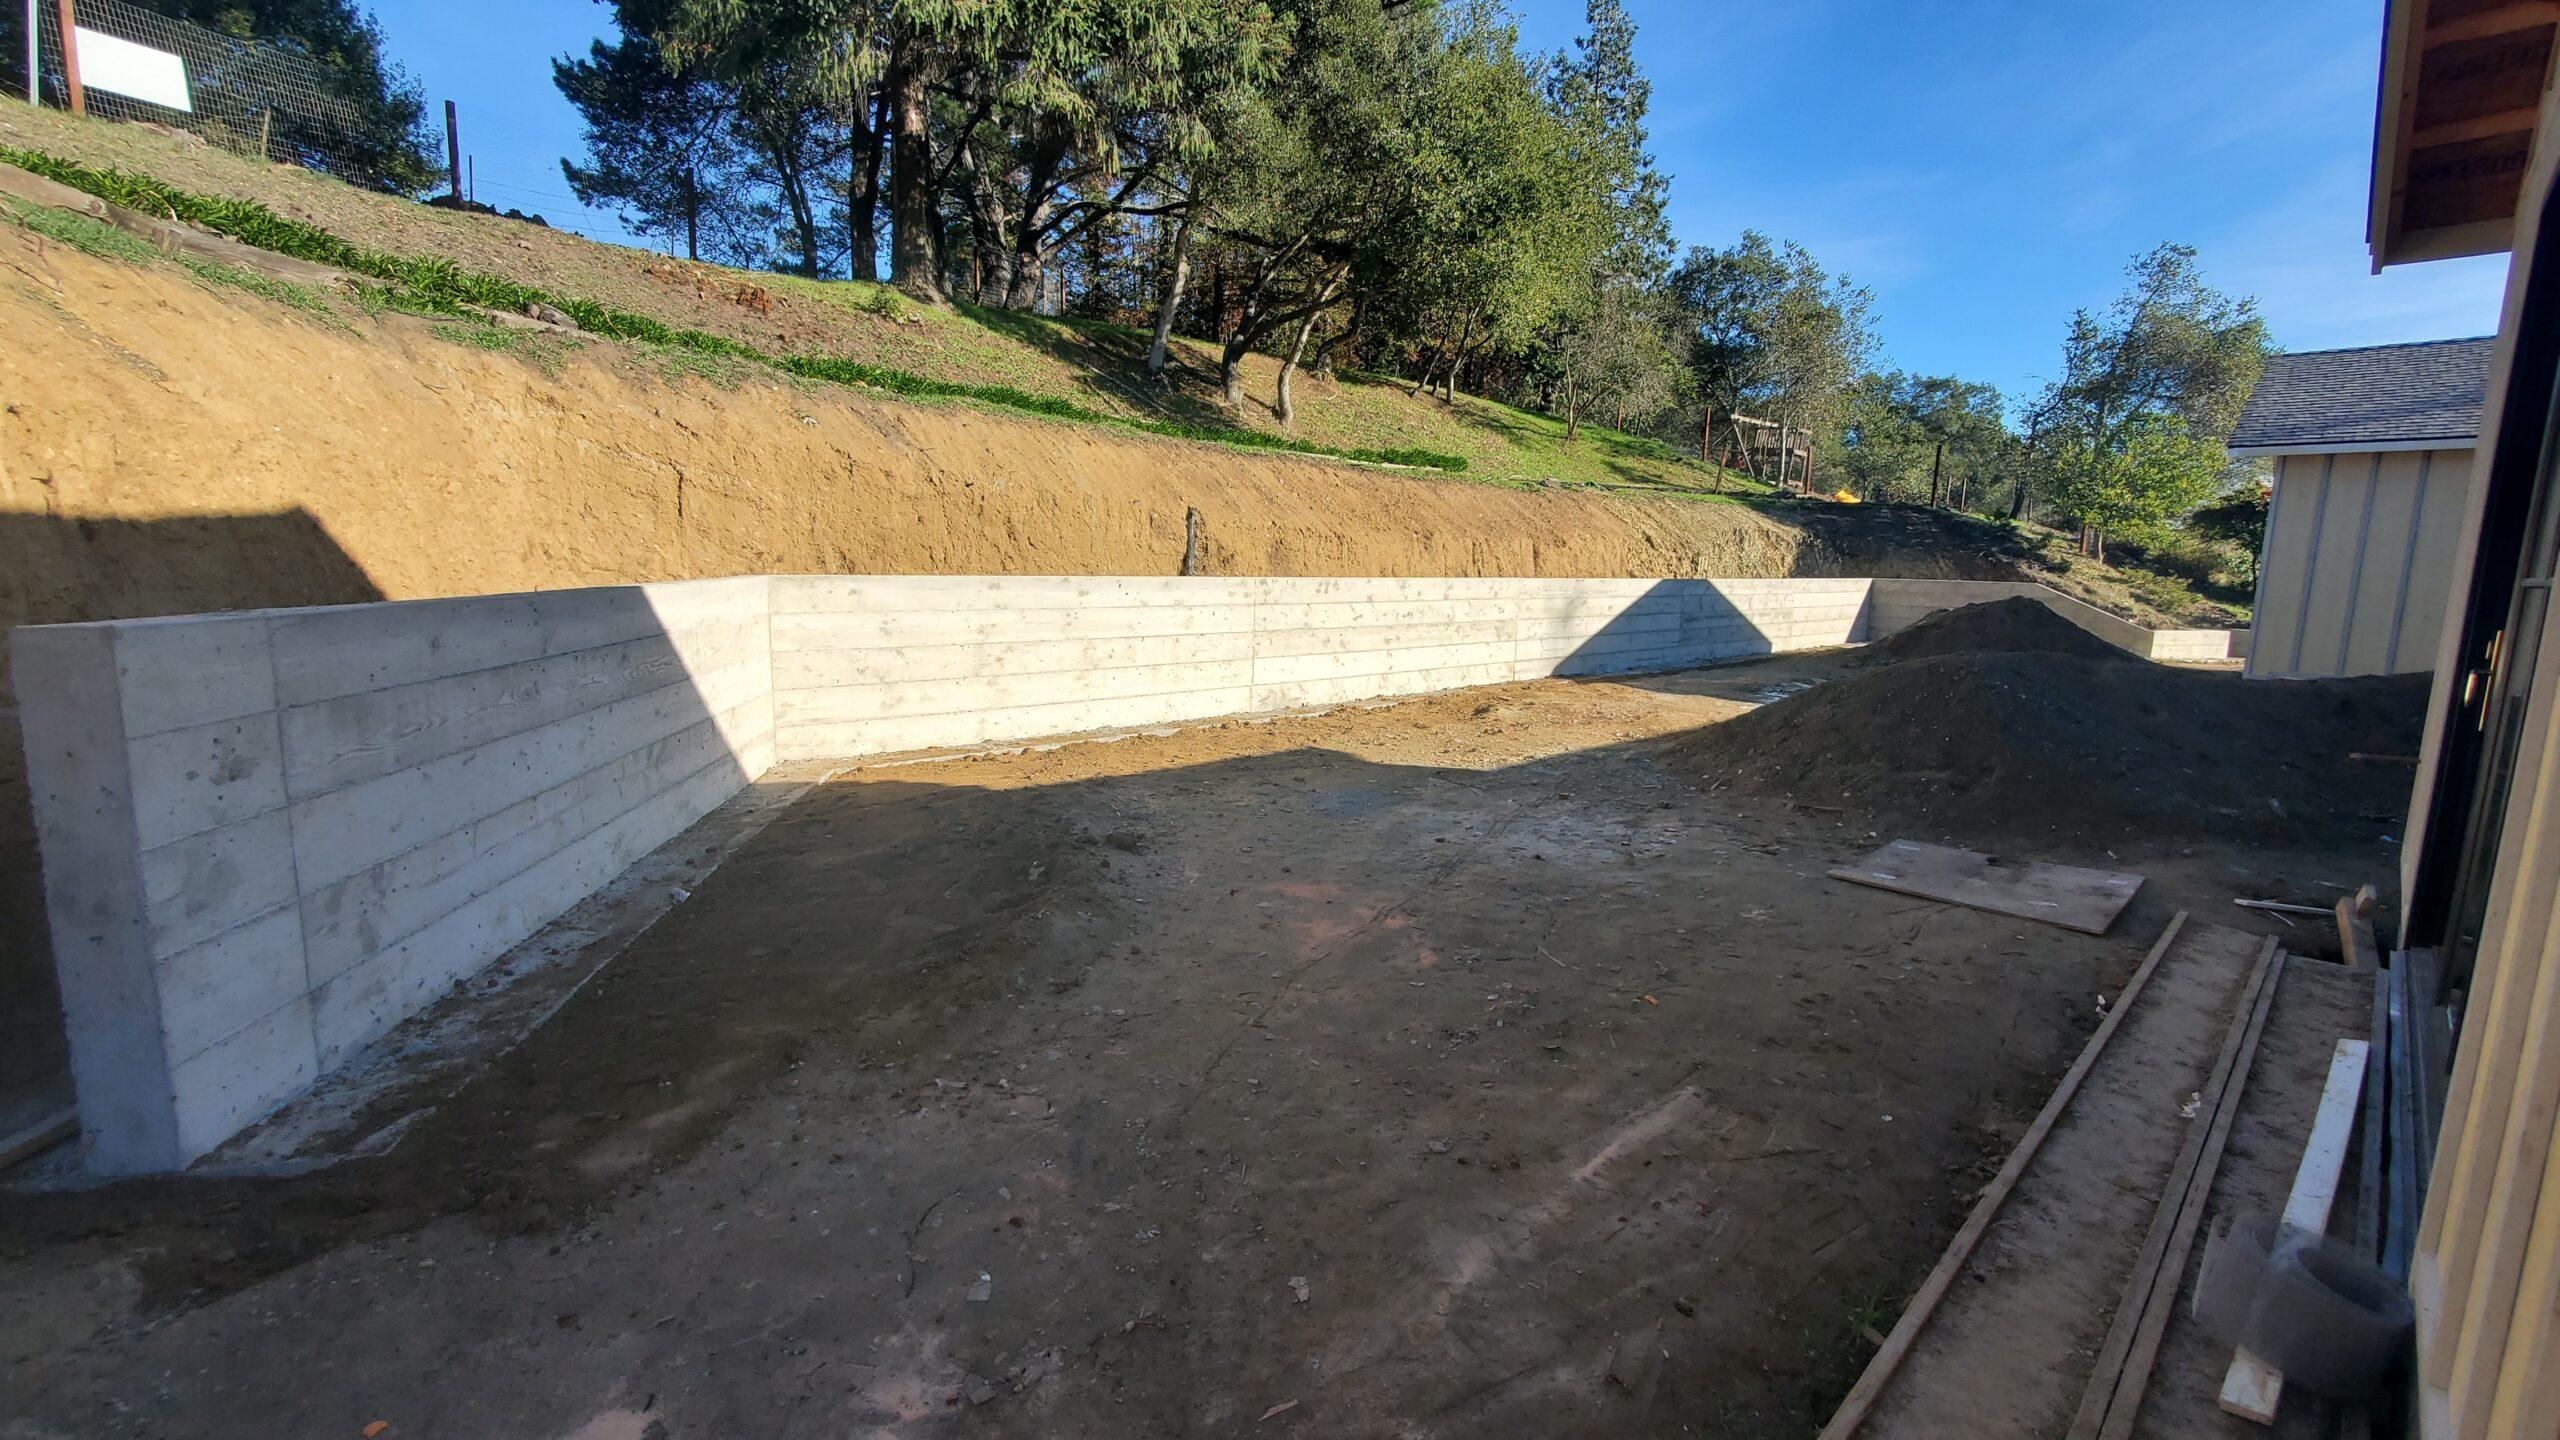 Orinda Concrete Retaining Wall – All Access Construction